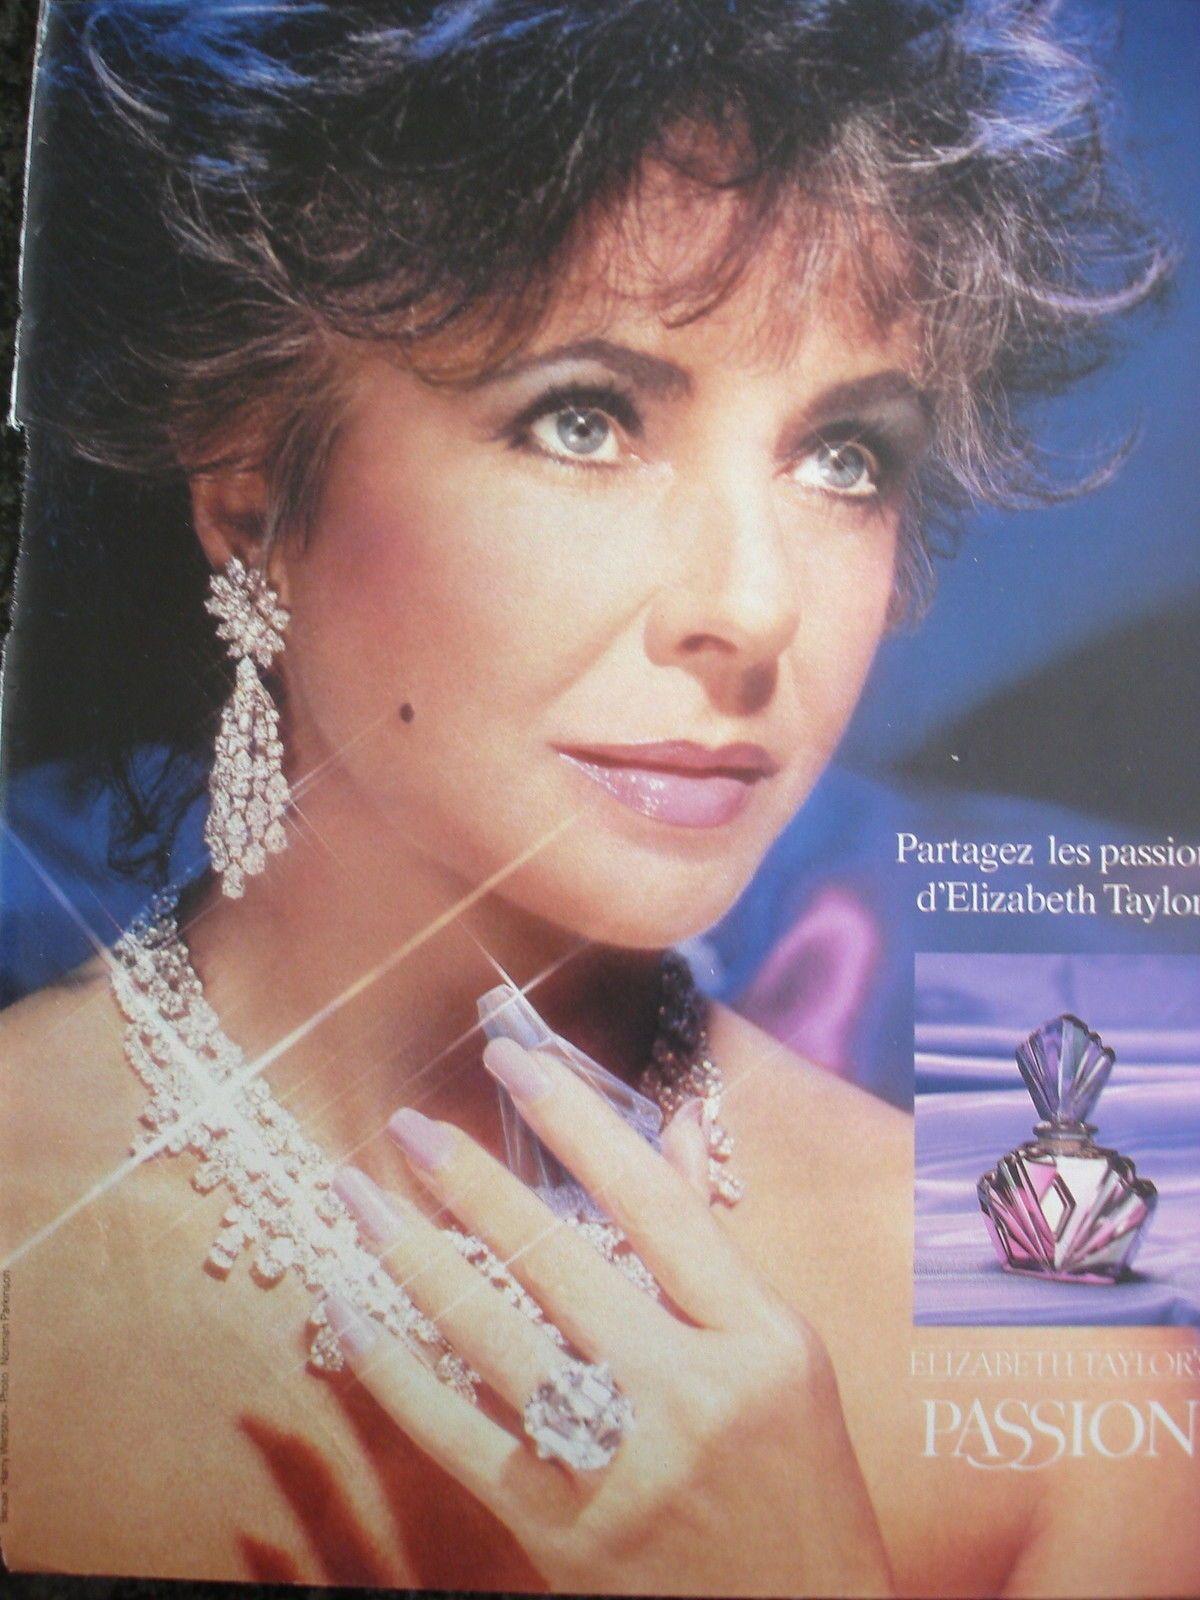 Elizabeth Taylor Publicte Parfum Fragrance Passion Advertising Clipping In Bijoux D Elizabeth Taylor Publicite Parfum Parfum D Epoque